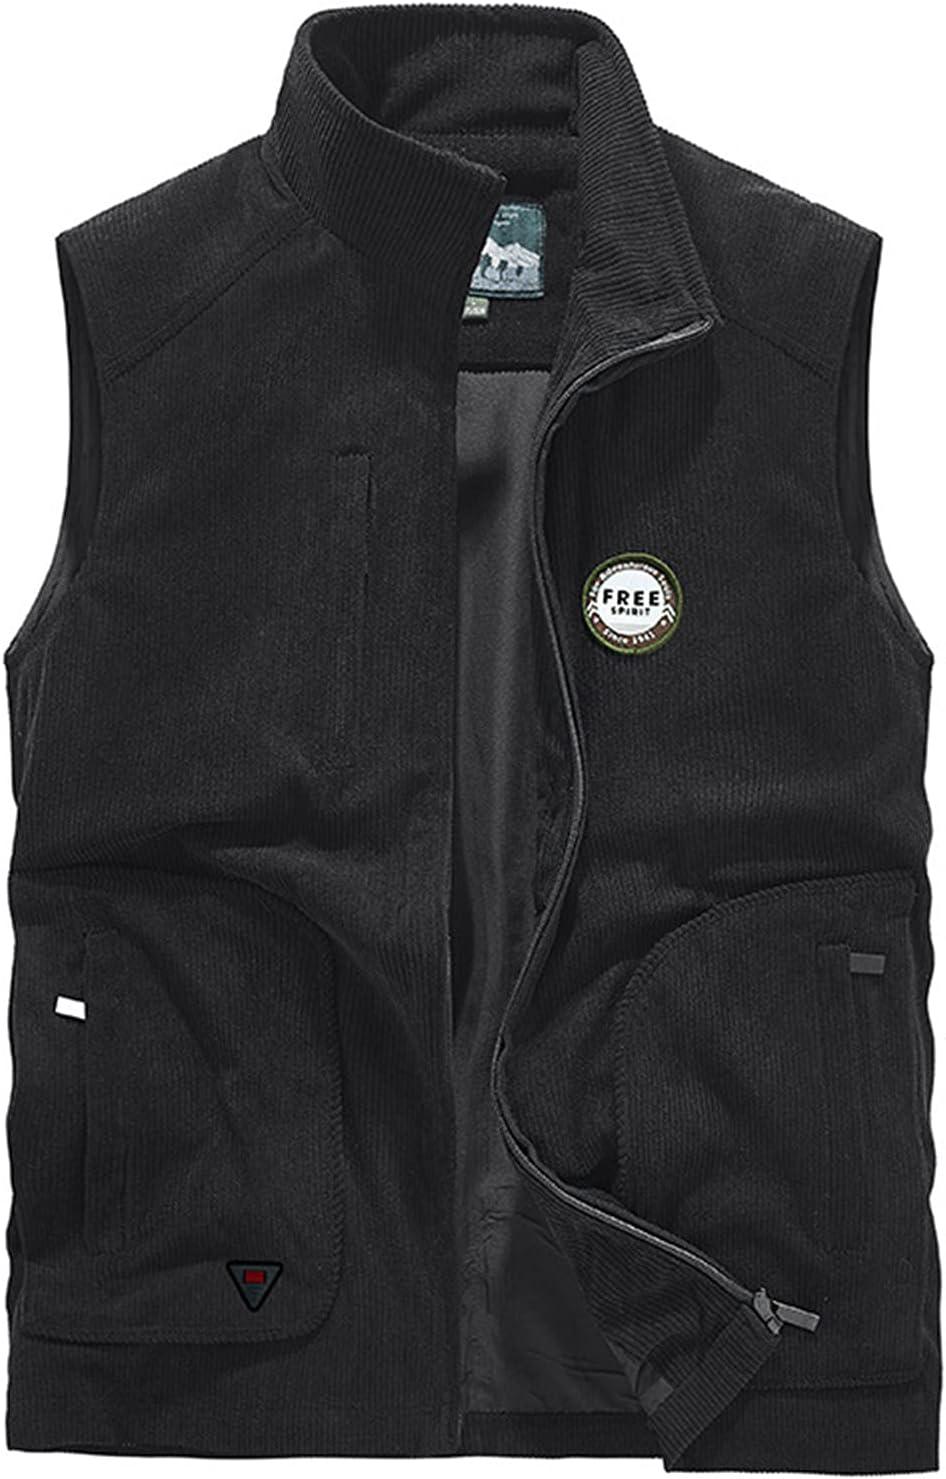 WFEI Vintage Corduroy Vests for Men Casual Hiking Waistcoat Outdoor Waistcoat Men's Sleeveless Jacket Top,Black,XXL